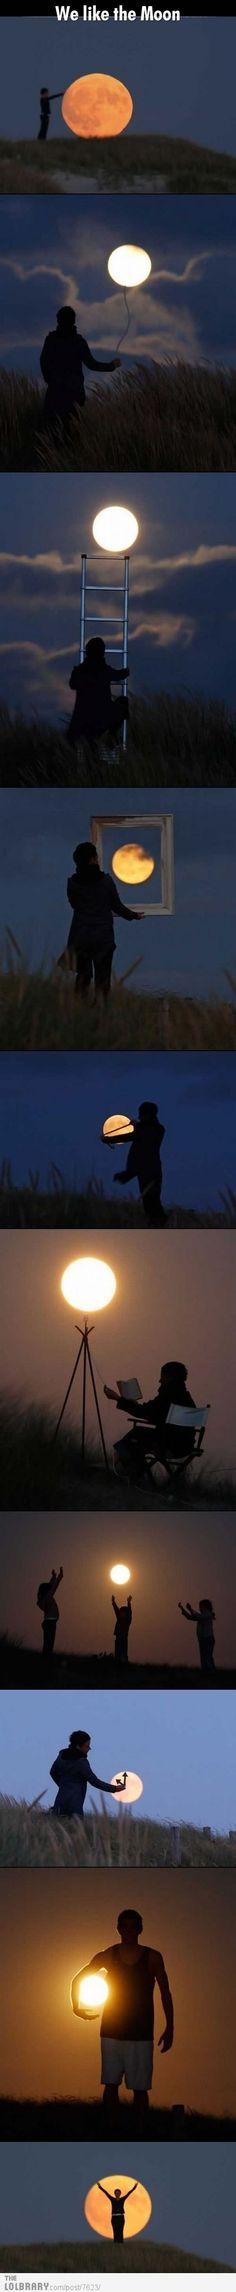 Luna lunita que brillantita